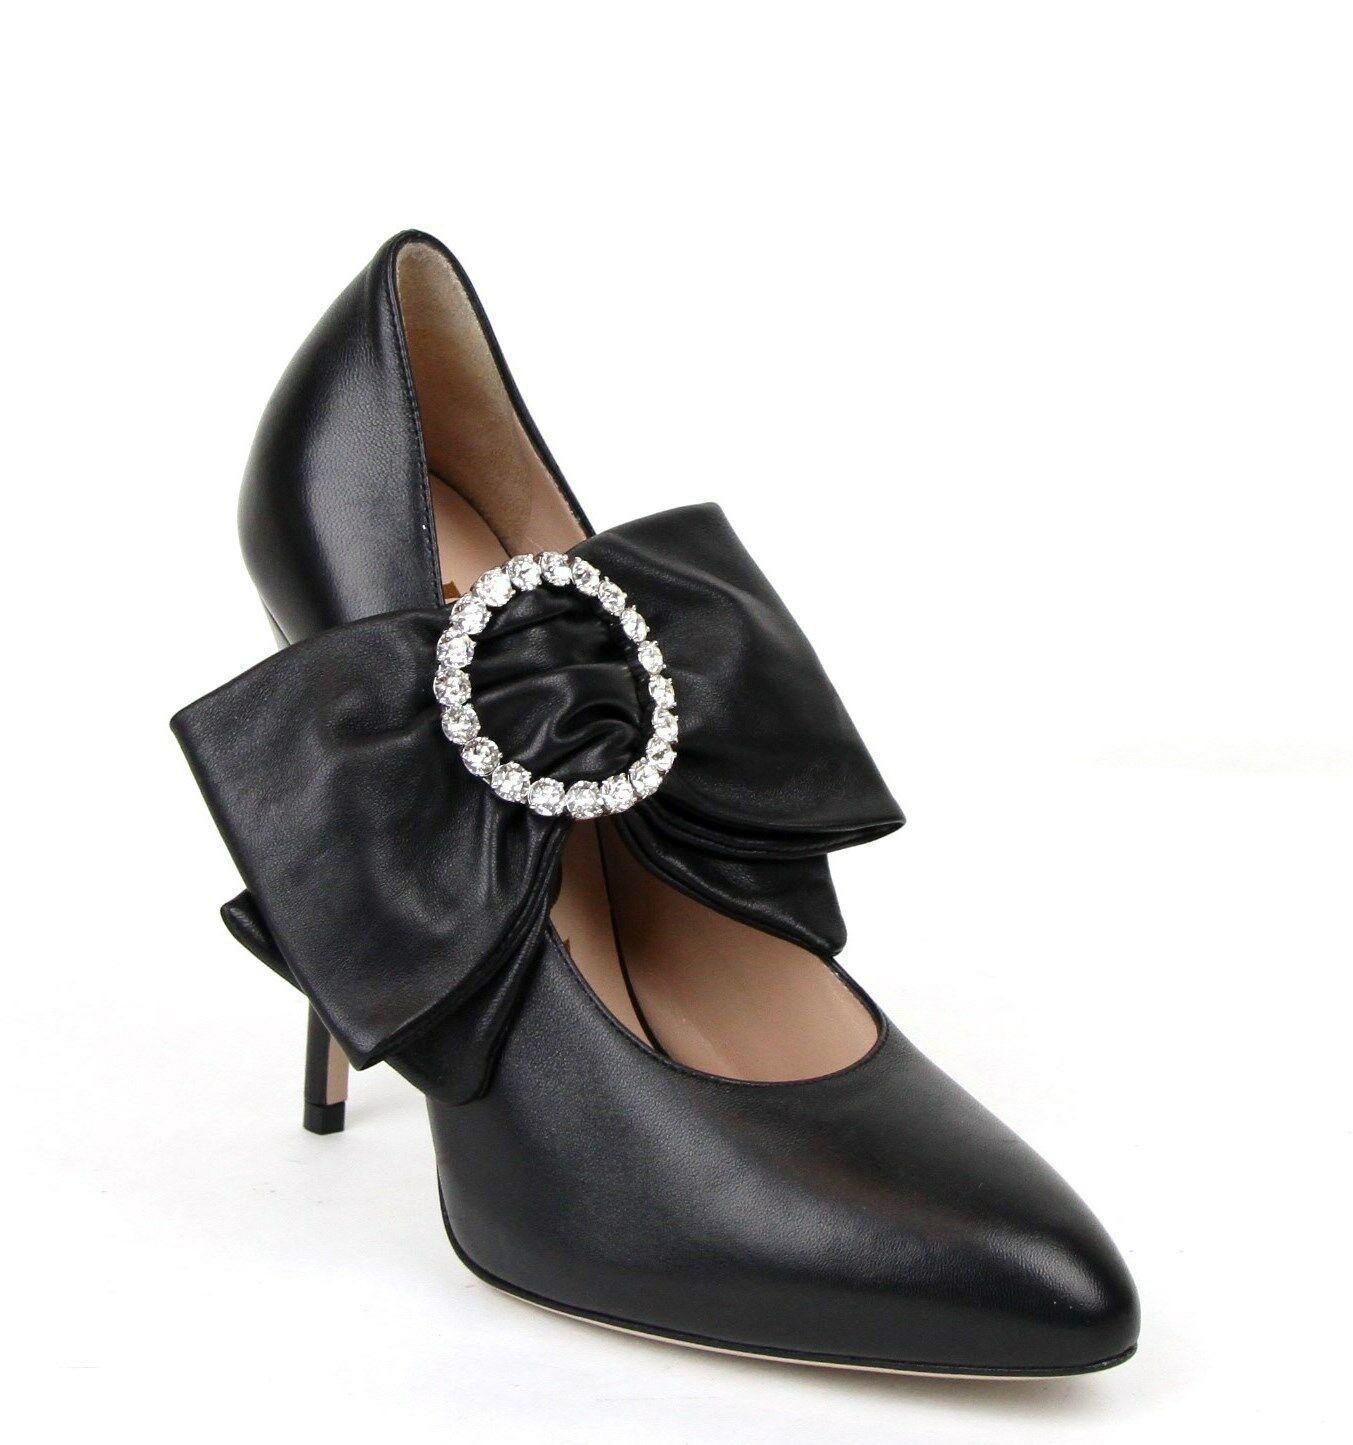 $960 Gucci Black Leather Heels W